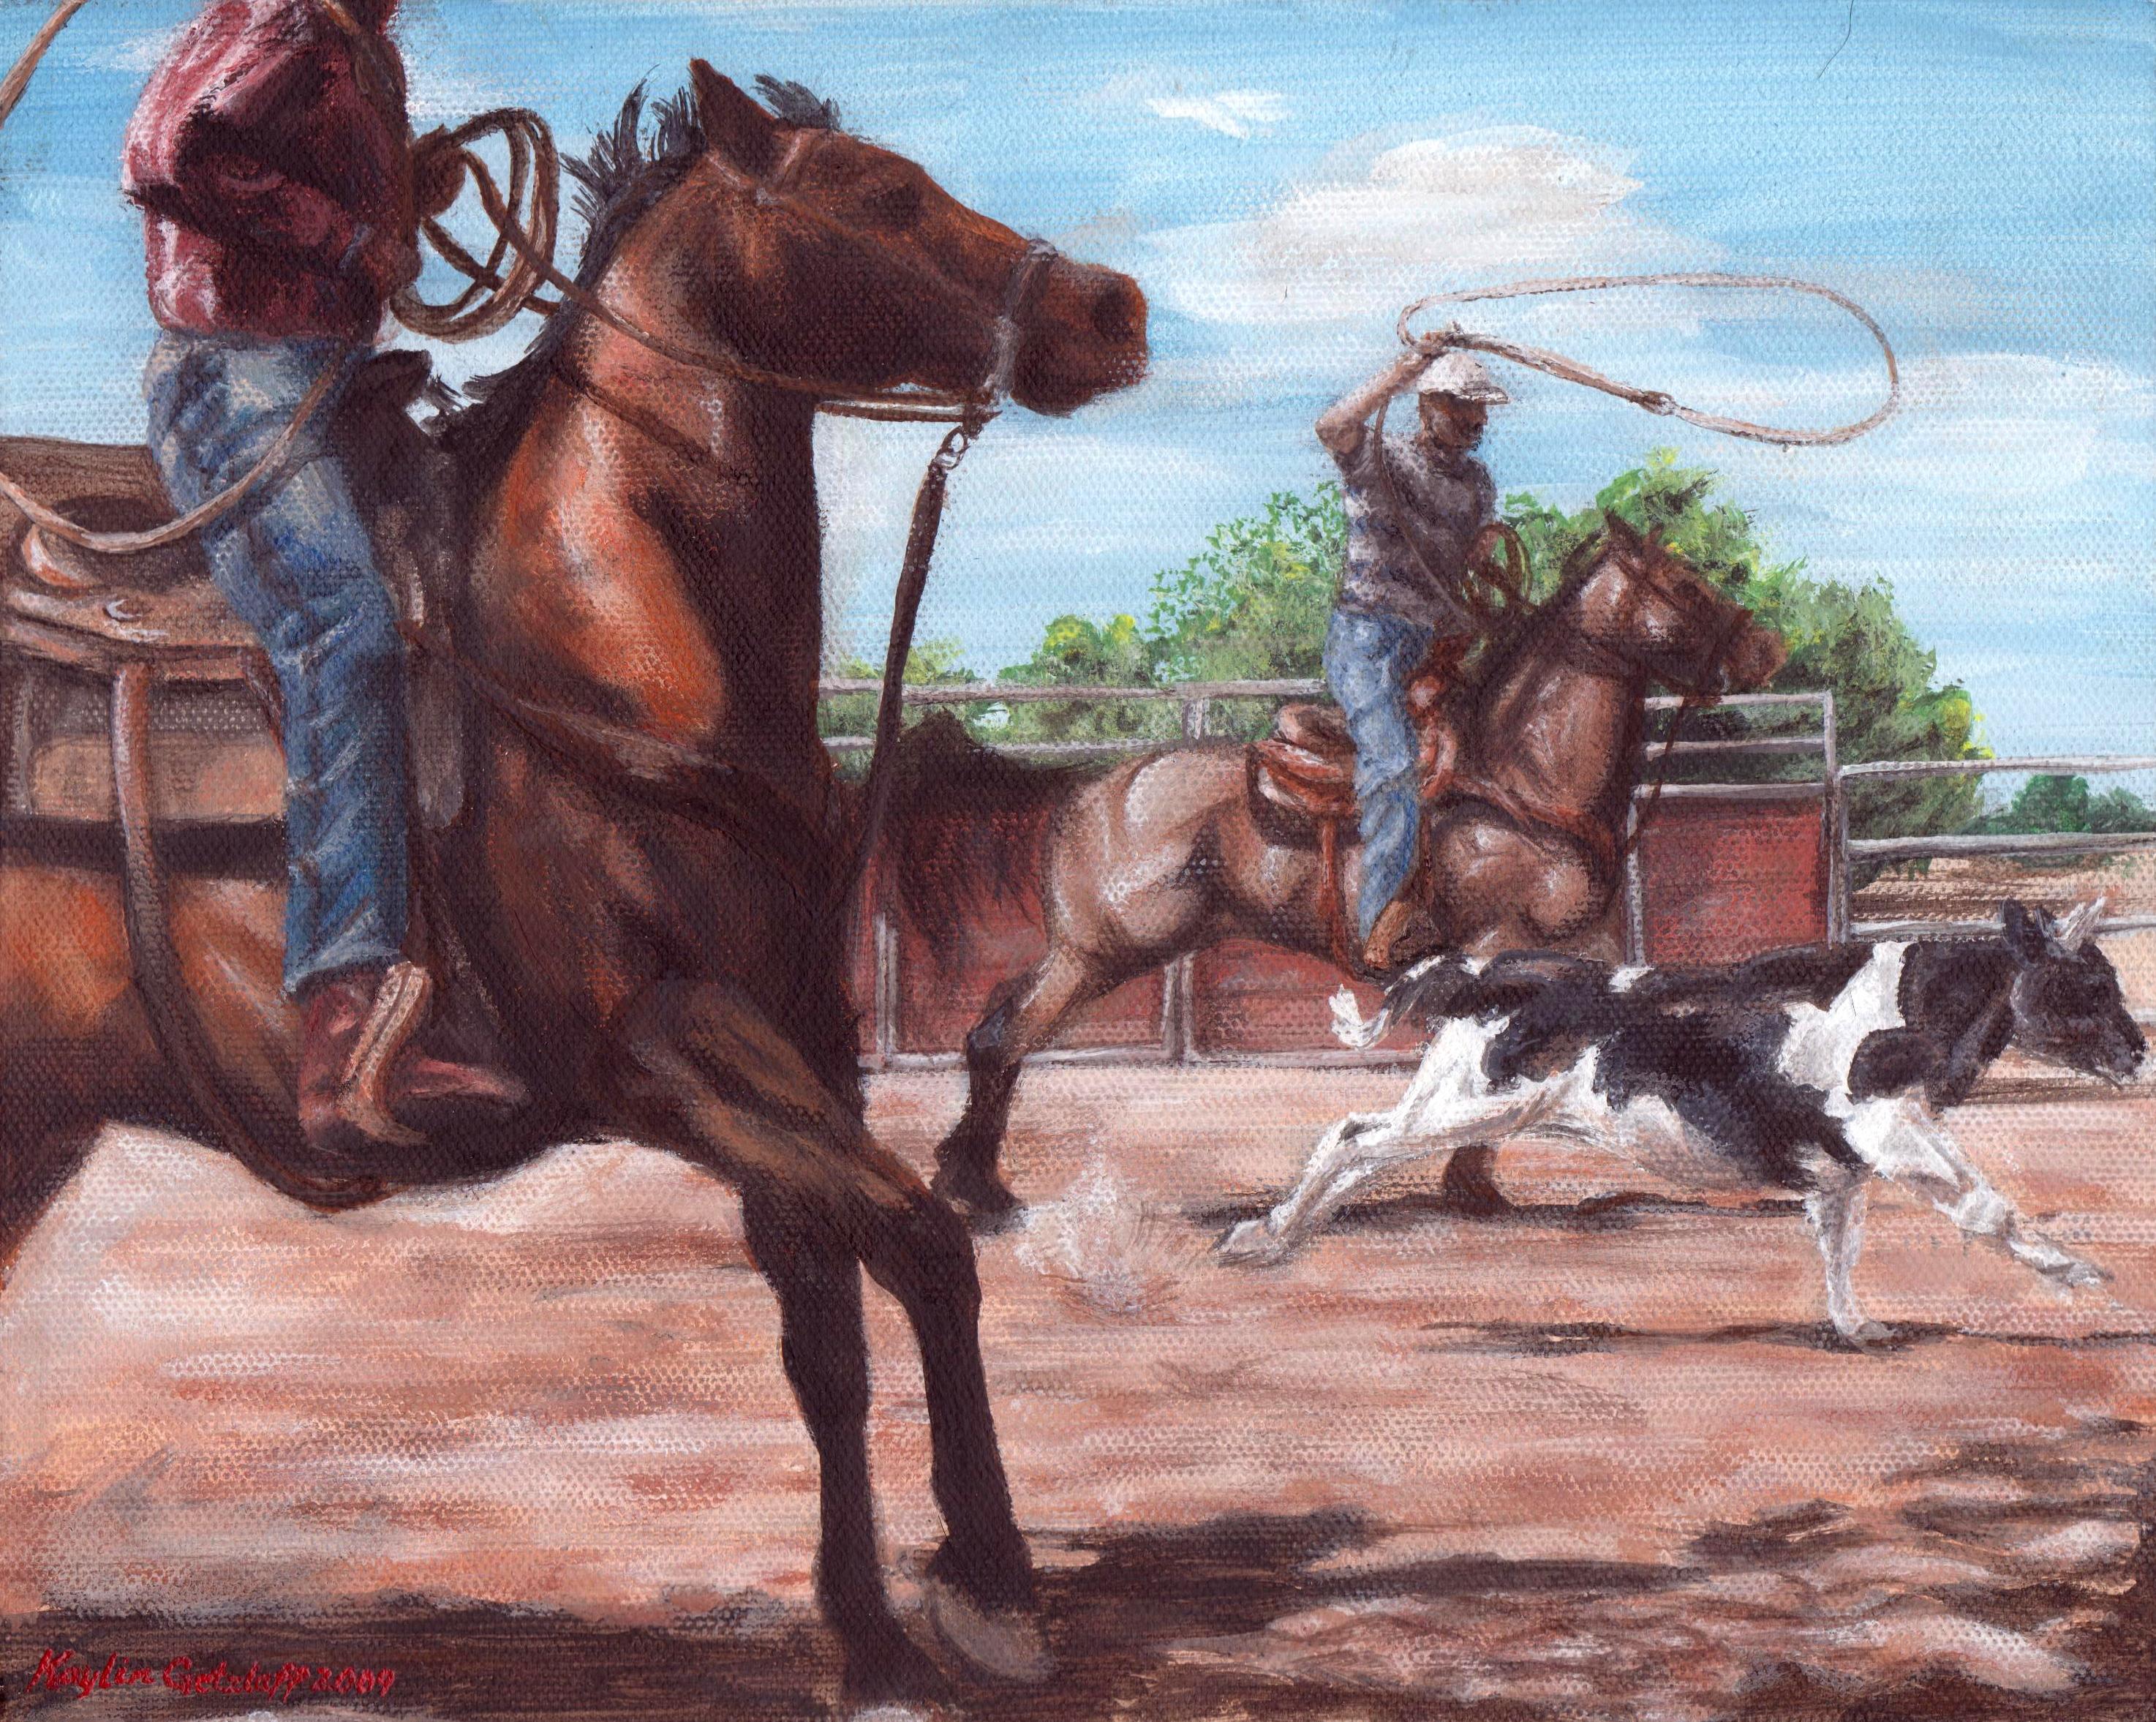 Kaylin colors colts: WSU veterinary medicine student shares equine art